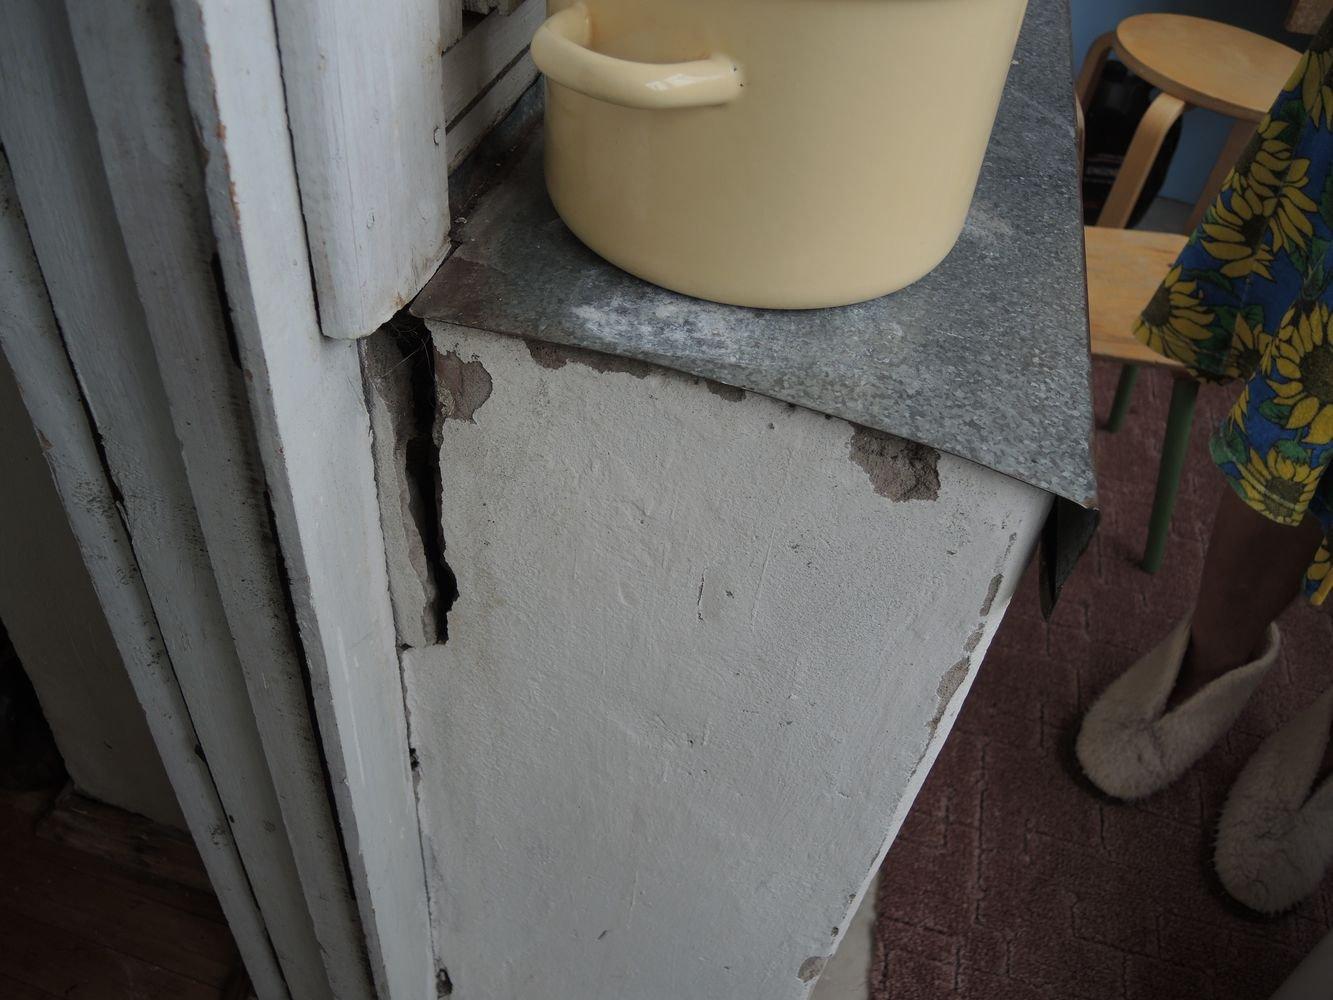 Такая трещина пошла на балконе в доме 9 по ул. Л. Толстого. Фото: ©День.org